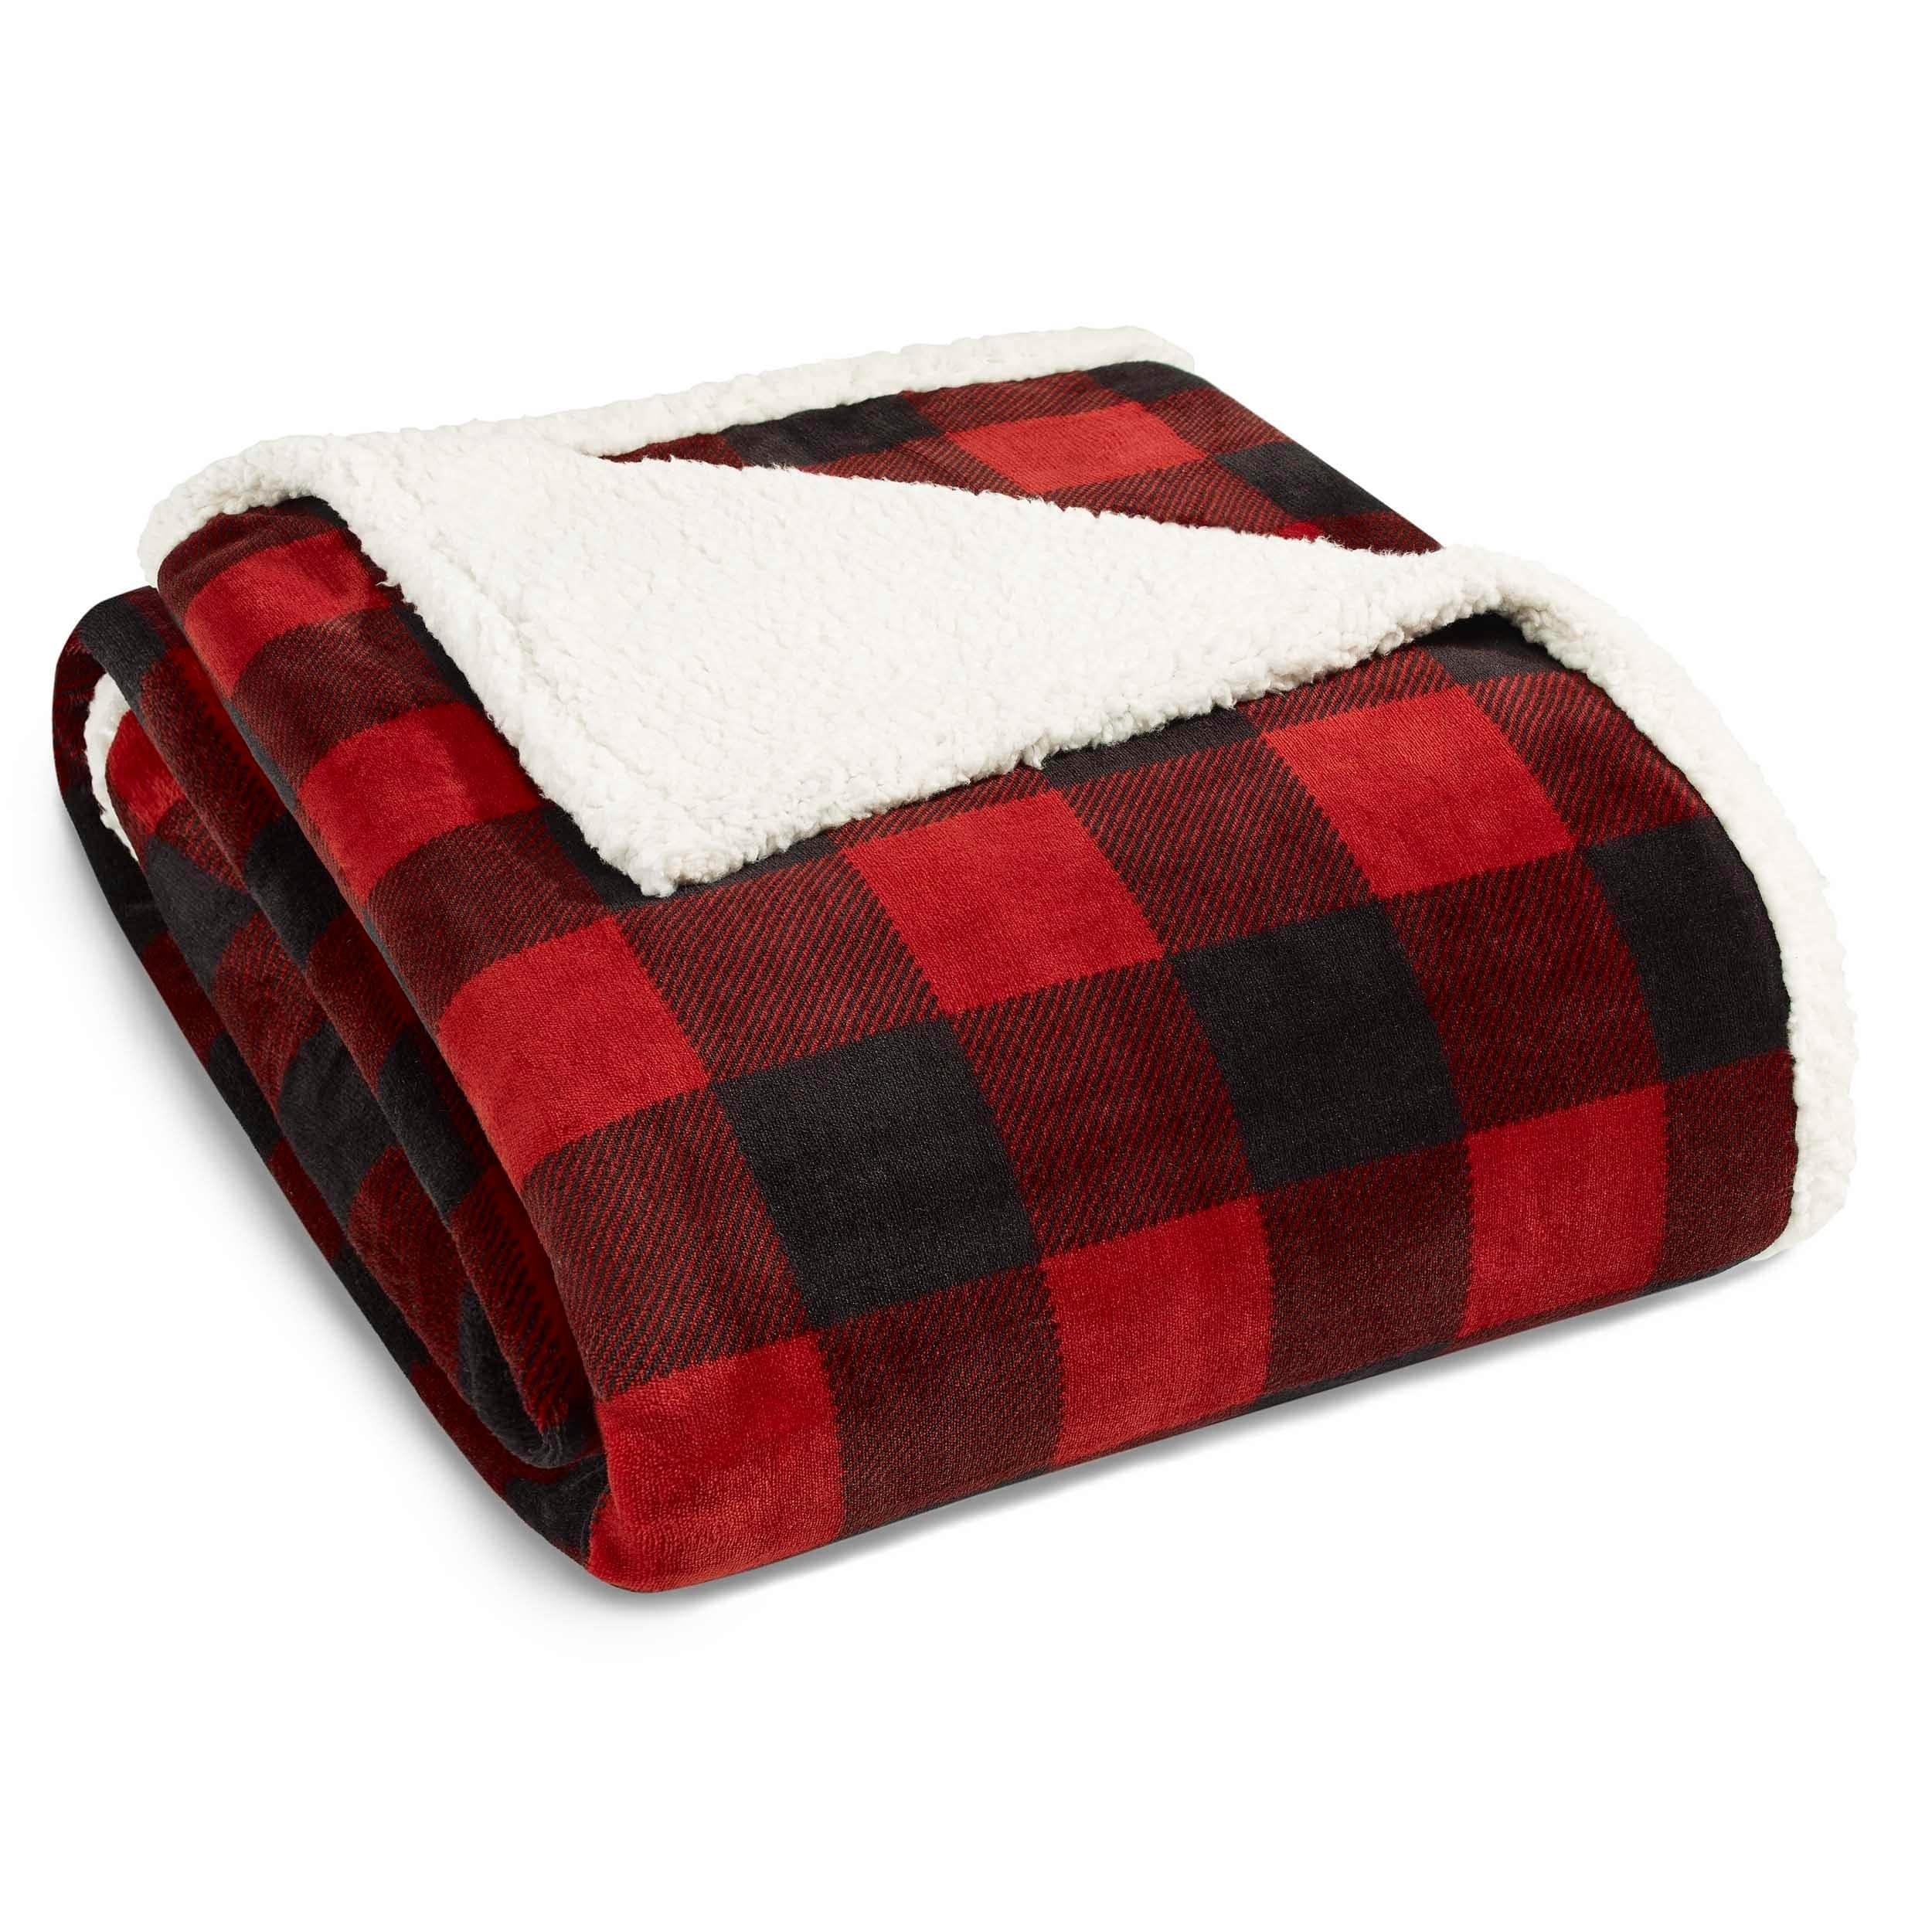 "WOOLRICH Velvet soft plush throw sherpa RED PLAID 50/"" x 60/"""